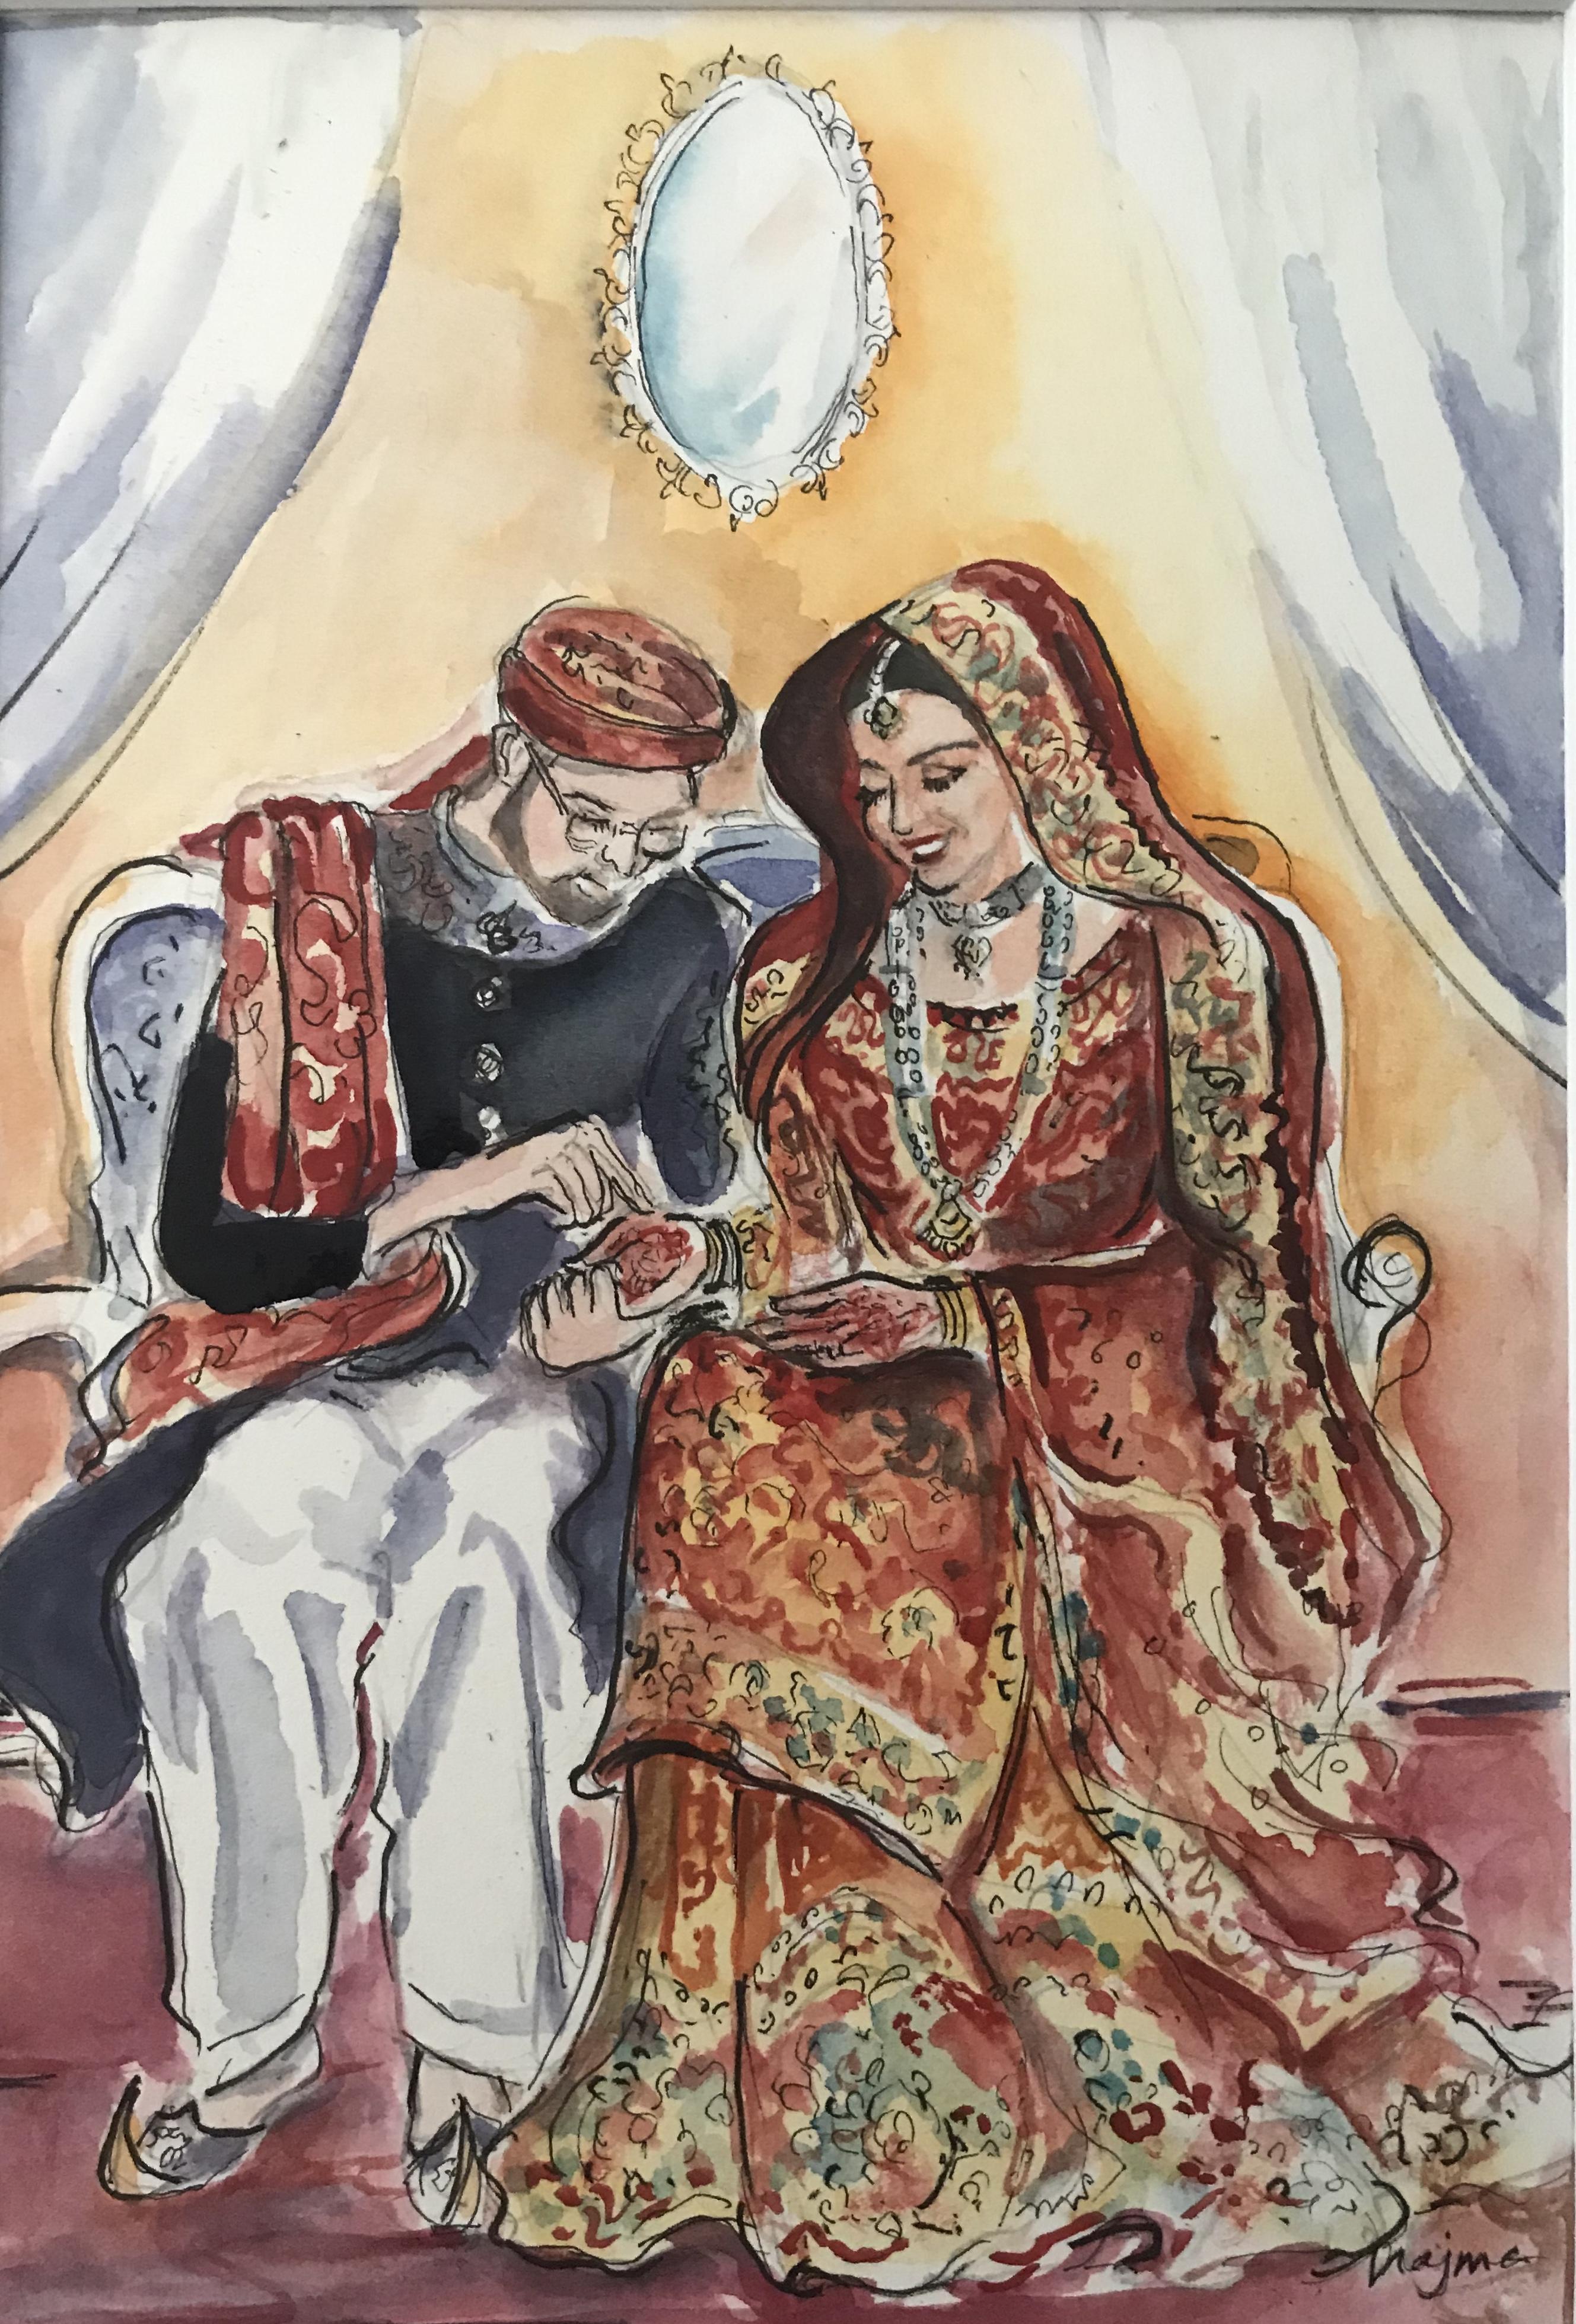 Maryam Youseffi